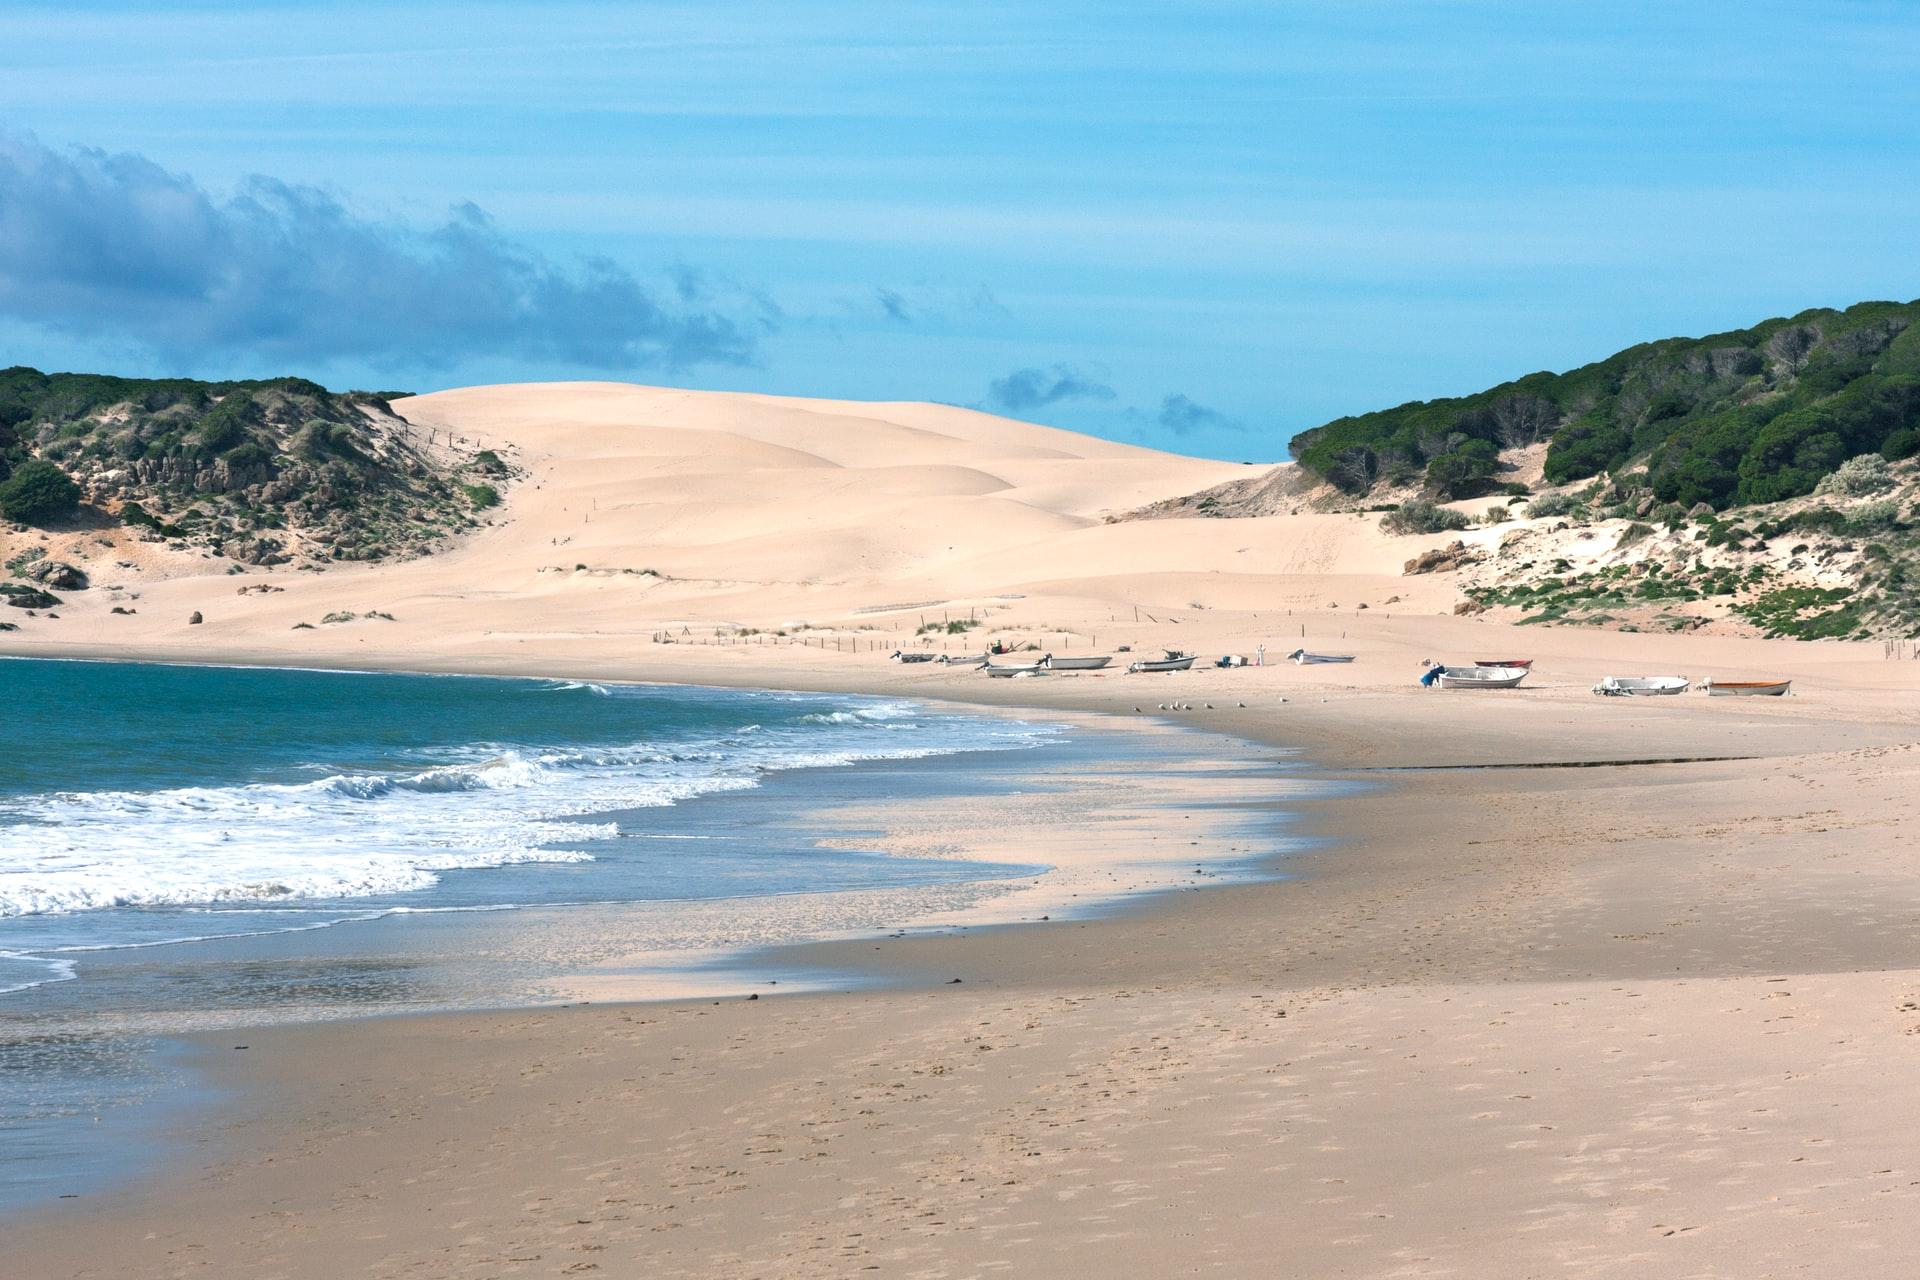 The Shimmering ATLANTIC COASTLINE Mountainous dunes and pristine protected coastline at Bolonia